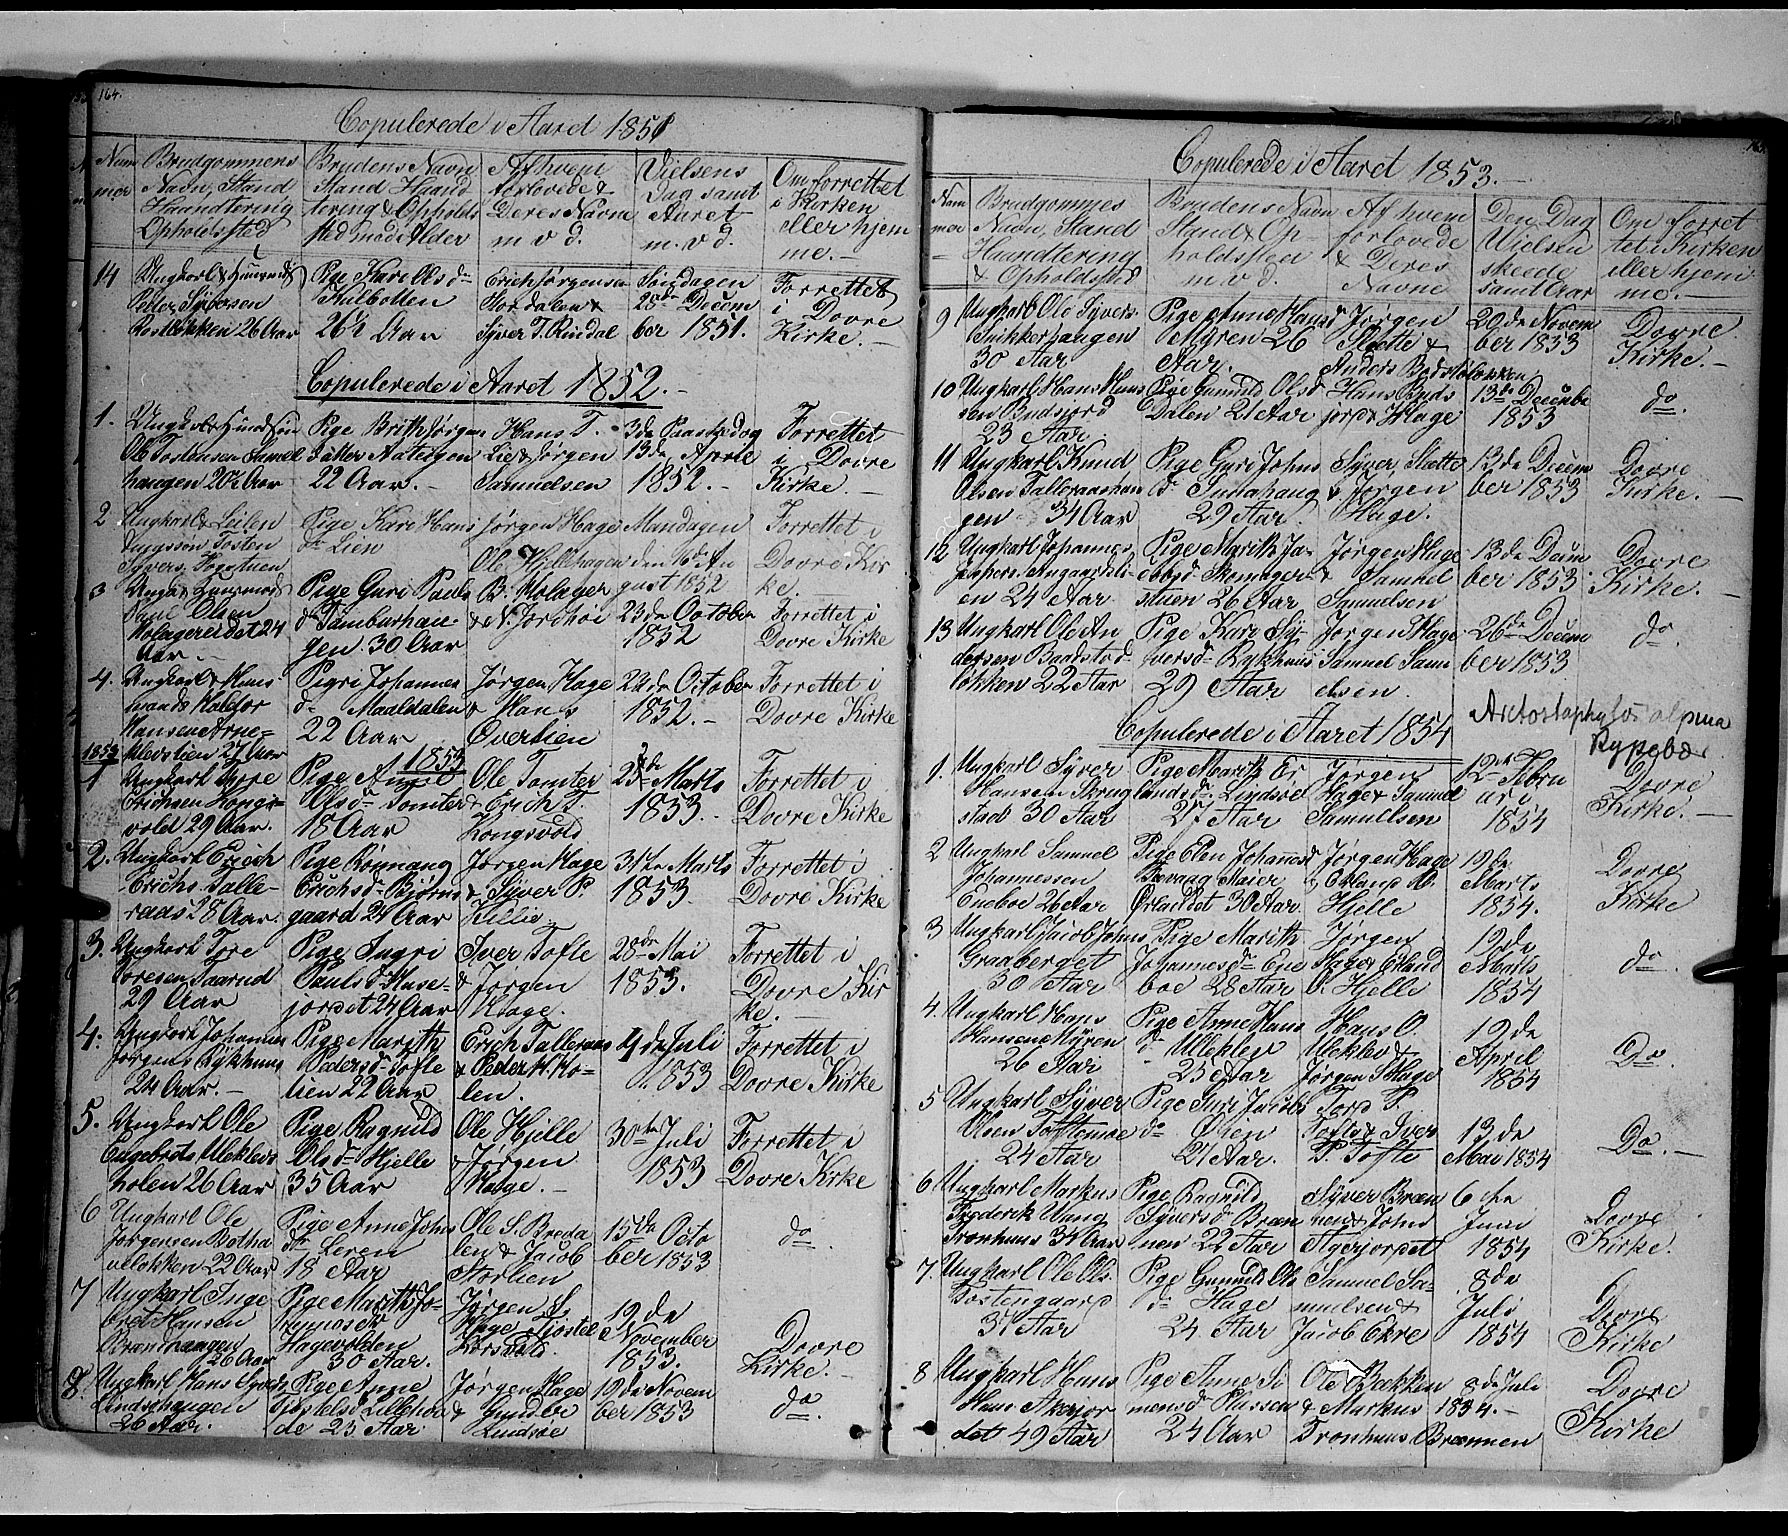 SAH, Lesja prestekontor, Klokkerbok nr. 3, 1842-1862, s. 164-165